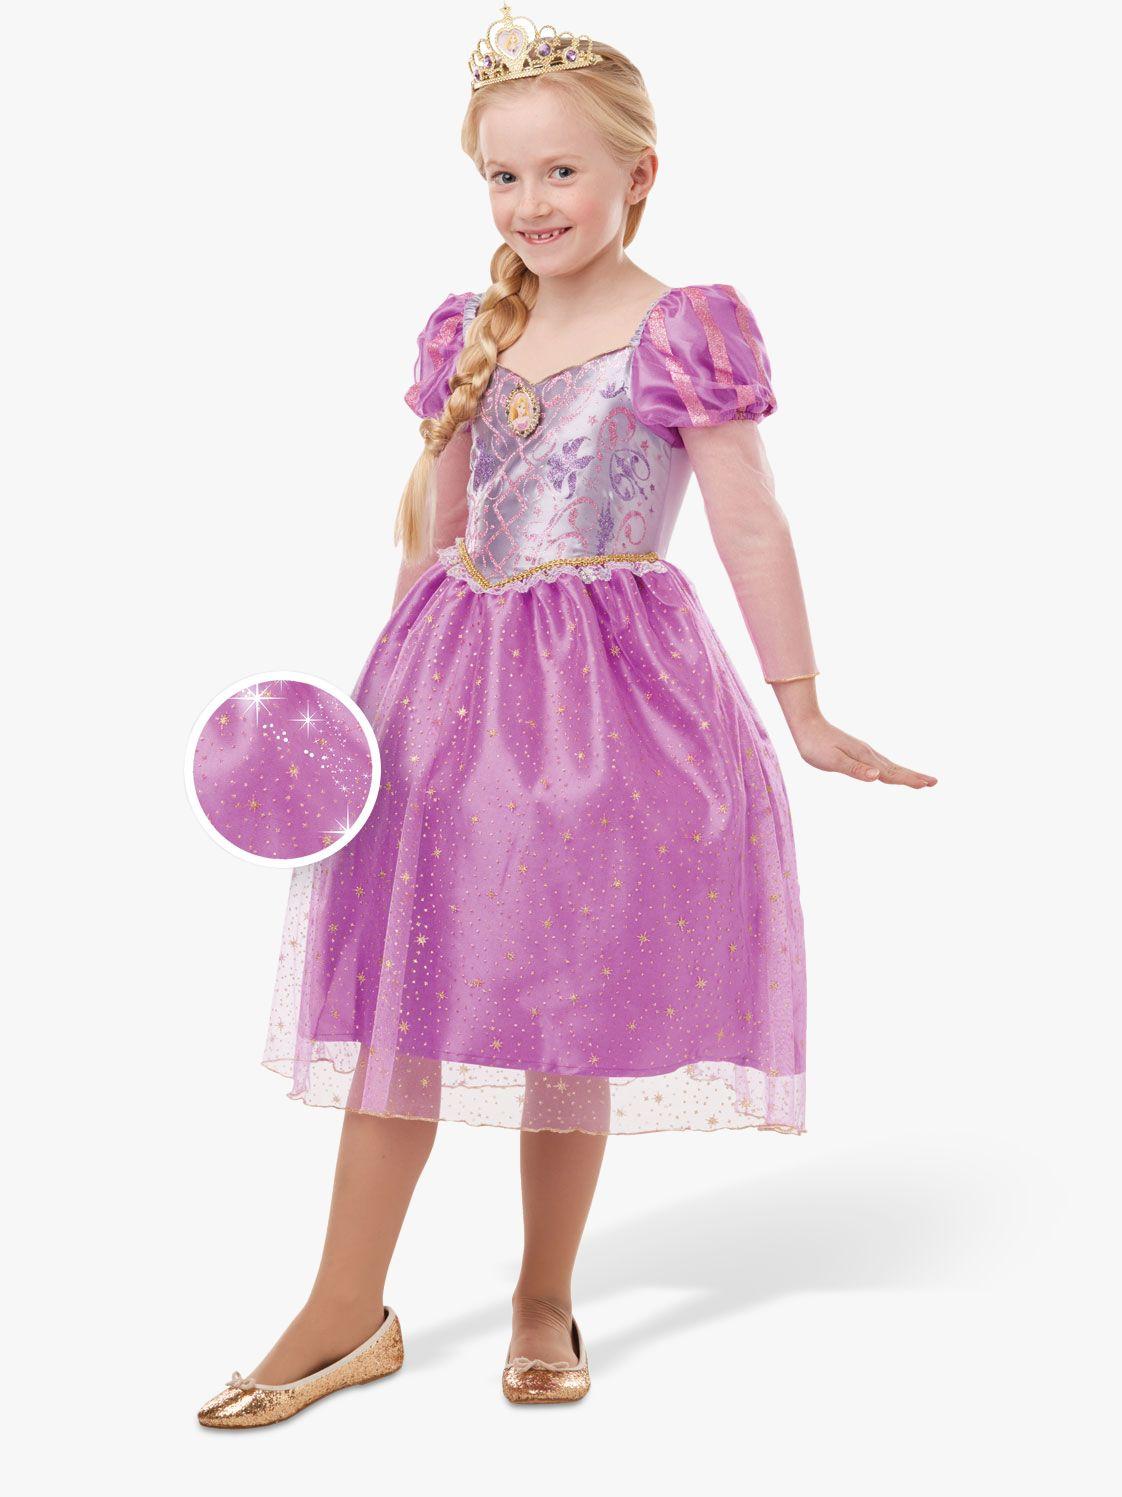 Rubies Disney Princess Rapunzel Children's Costume, 5-6 years